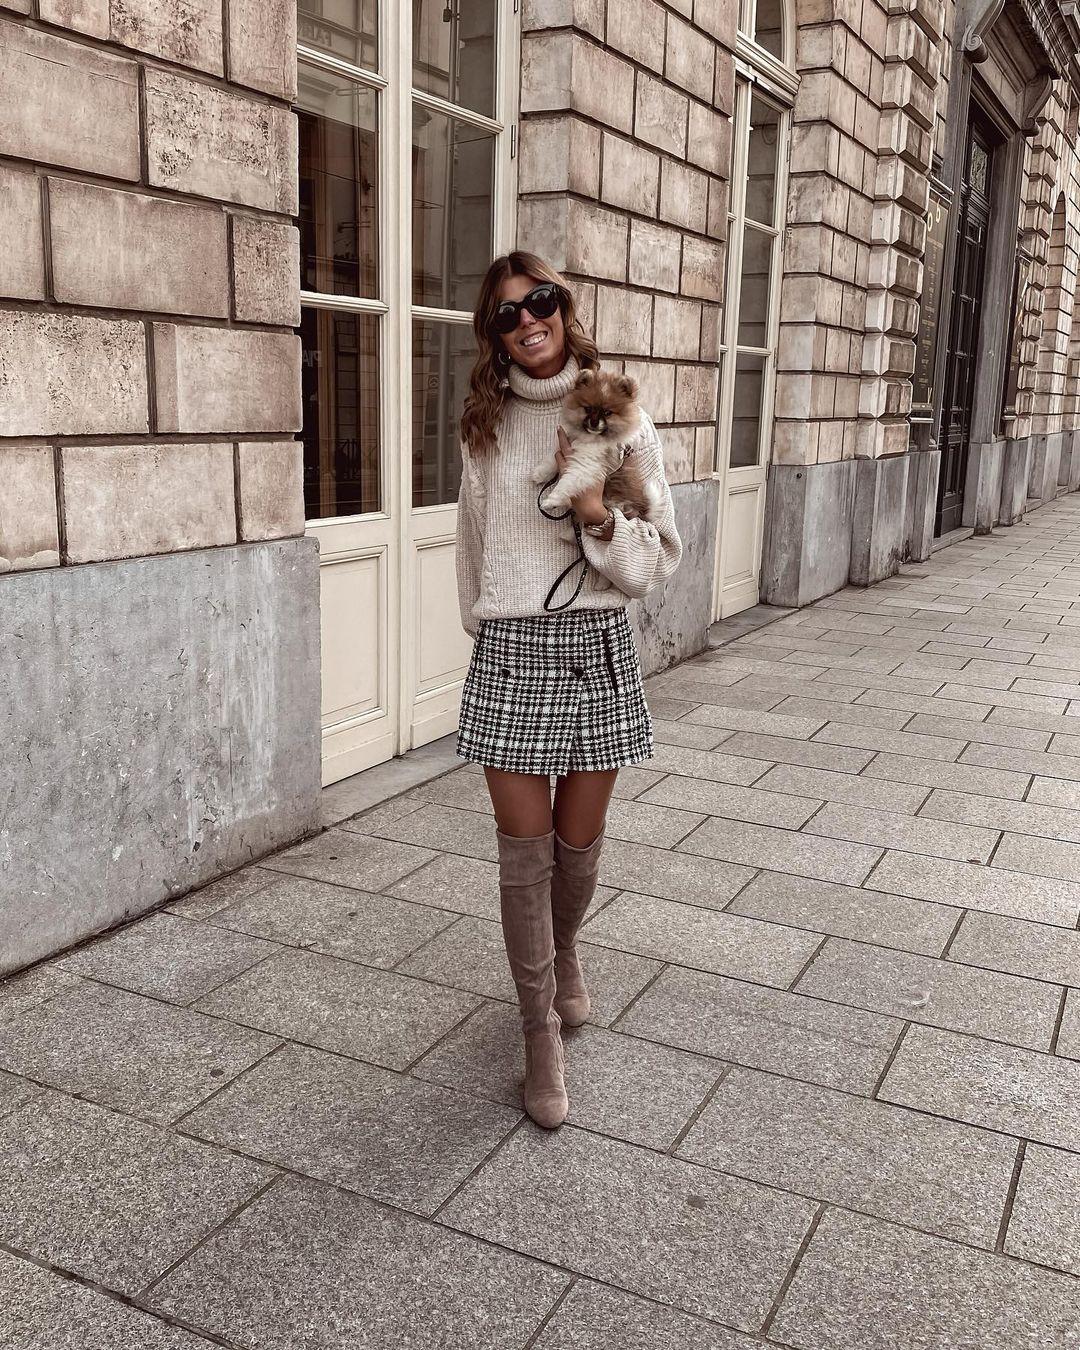 skirt with buttons de Stradivarius sur nooomsworld